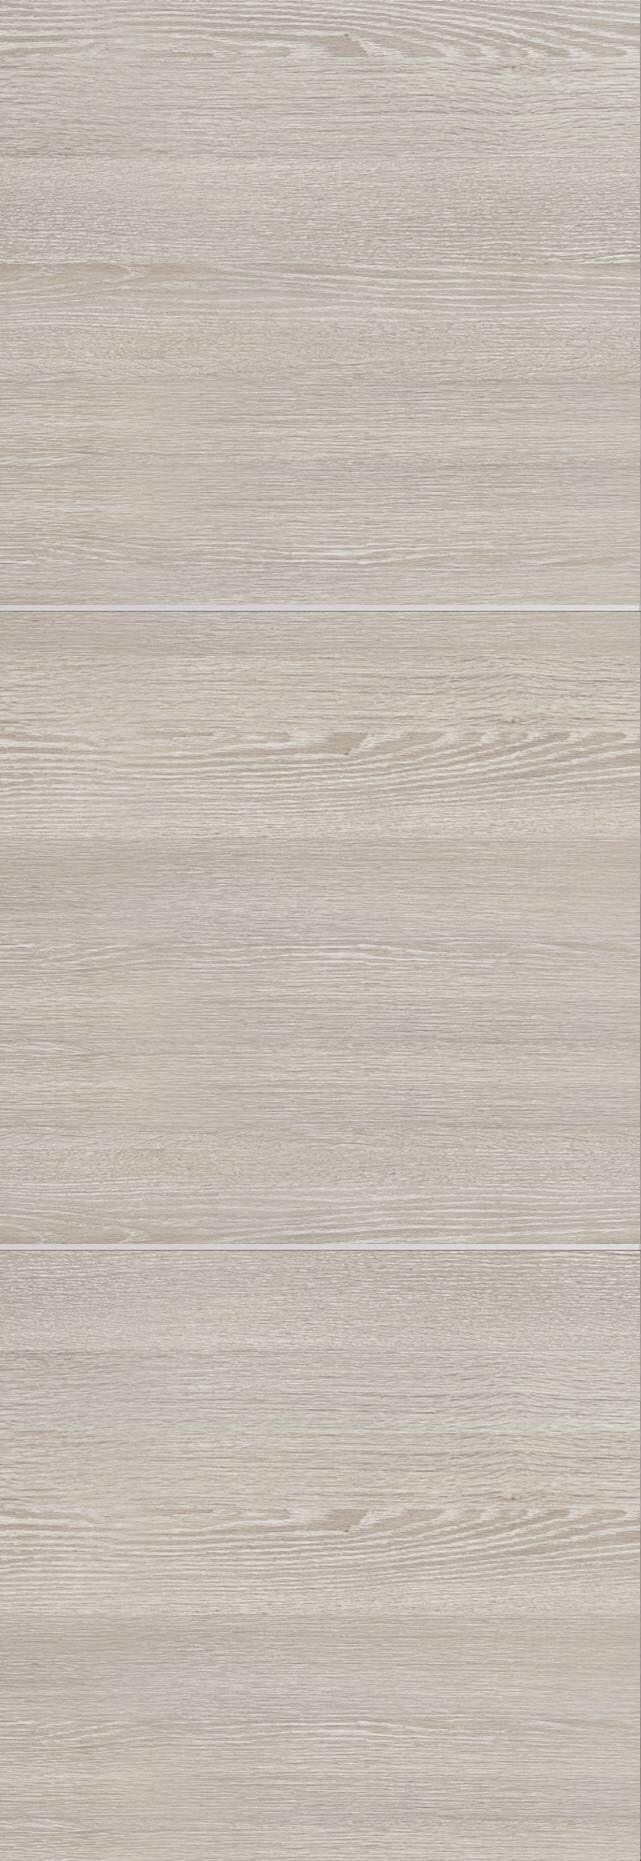 Tivoli В-3 Invisible цвет - Серый дуб Без стекла (ДГ)